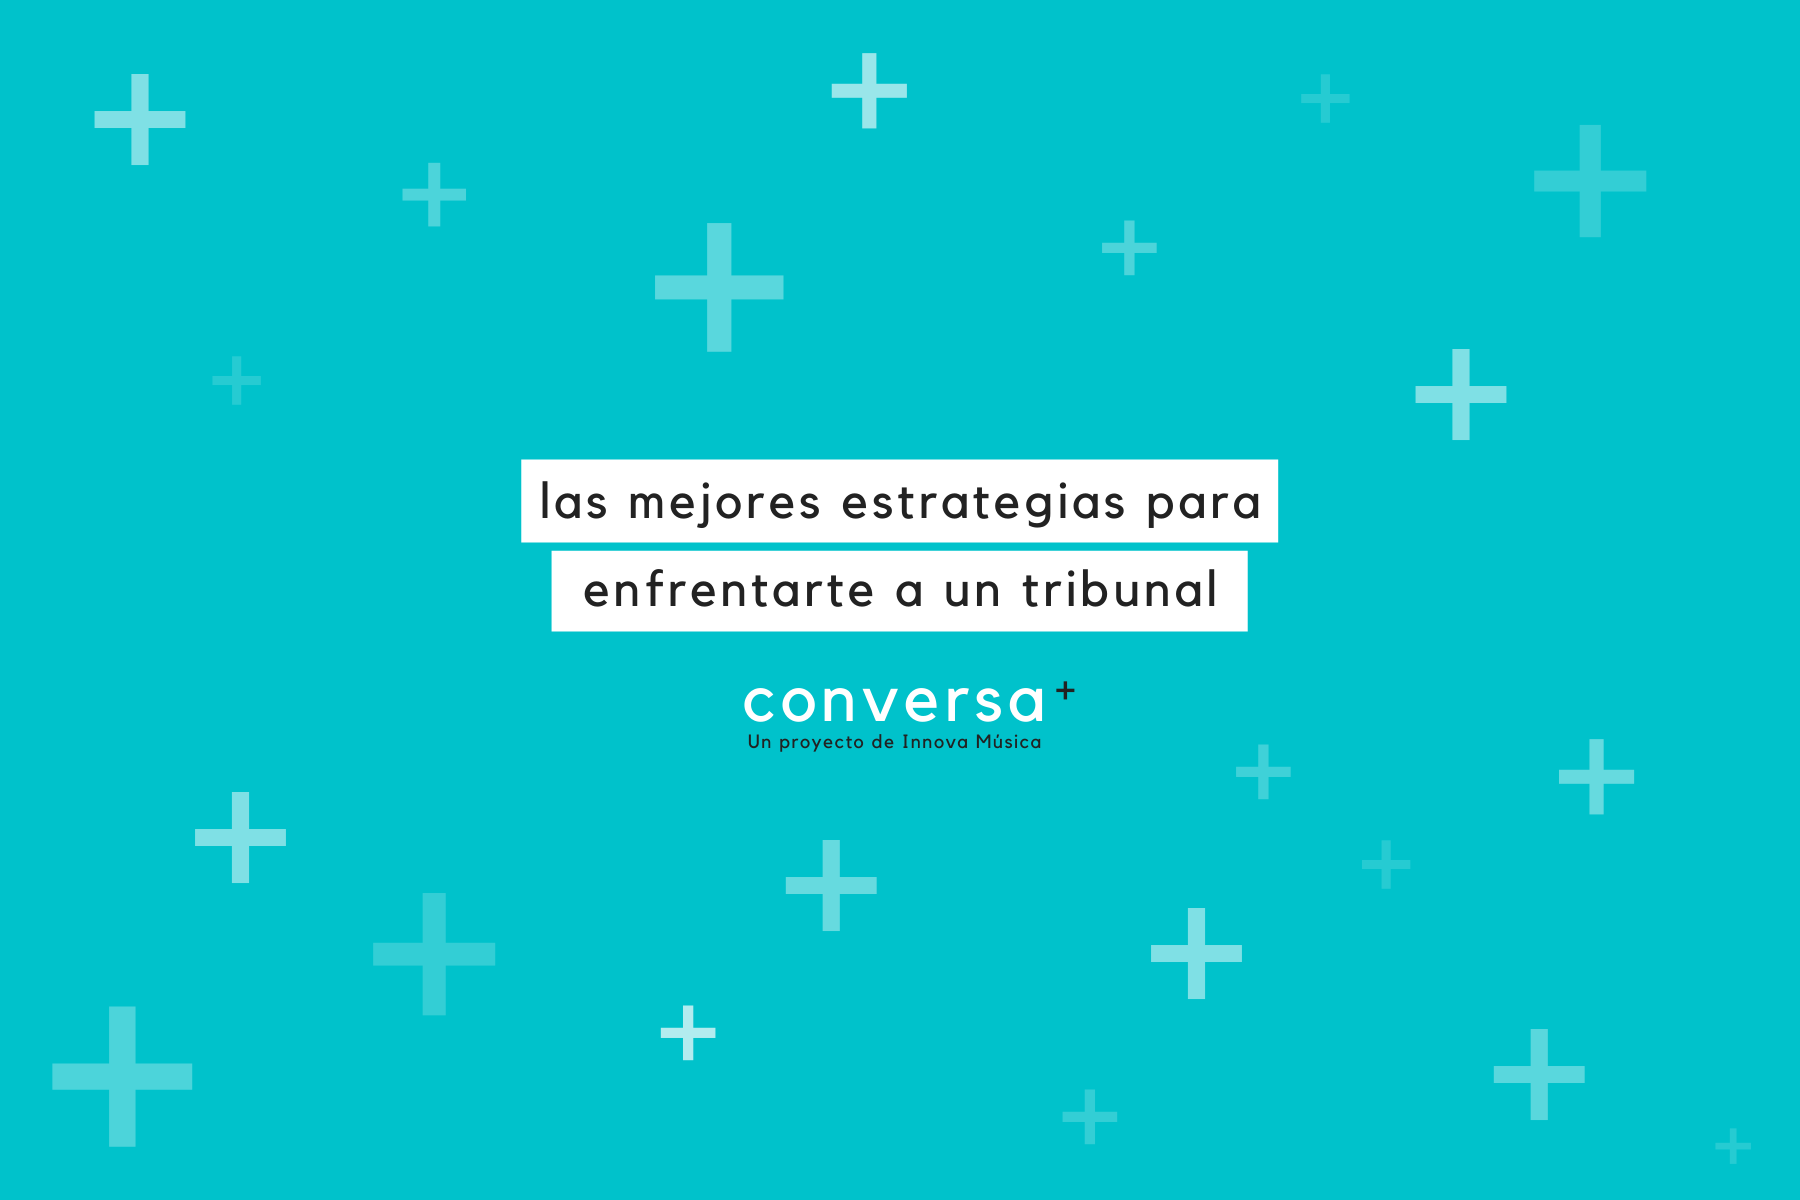 conversa1